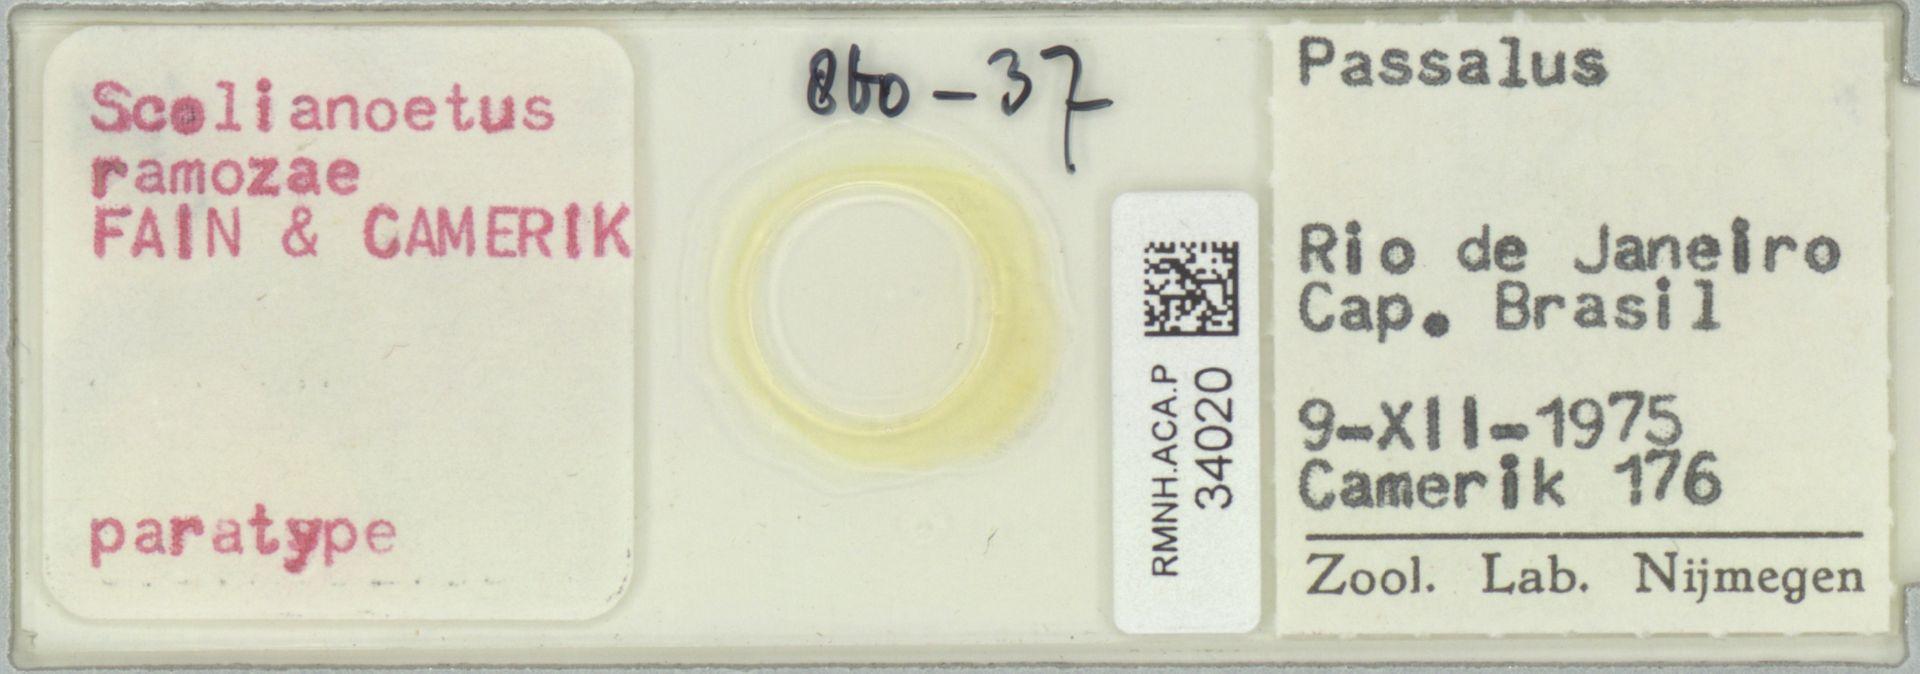 RMNH.ACA.P.34020   Scolianeotus ramozae Fain & Camerik